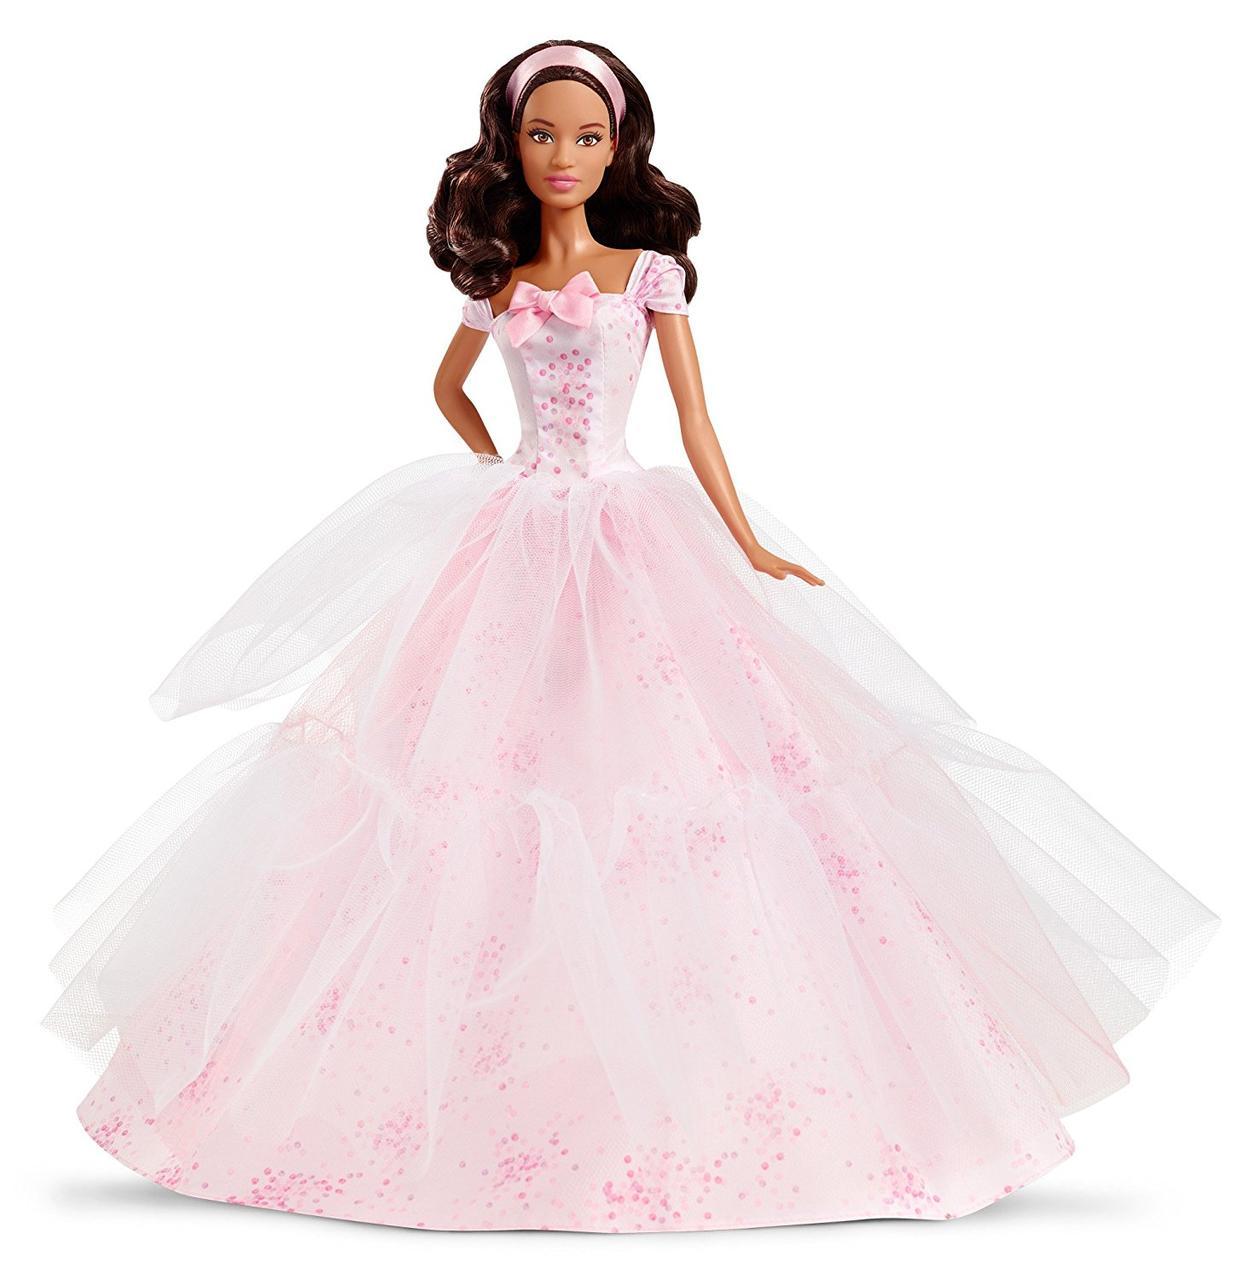 Barbie Барби Пожелания ко дню рождения Birthday Wishes 2016 Barbie Doll Dark Brunette